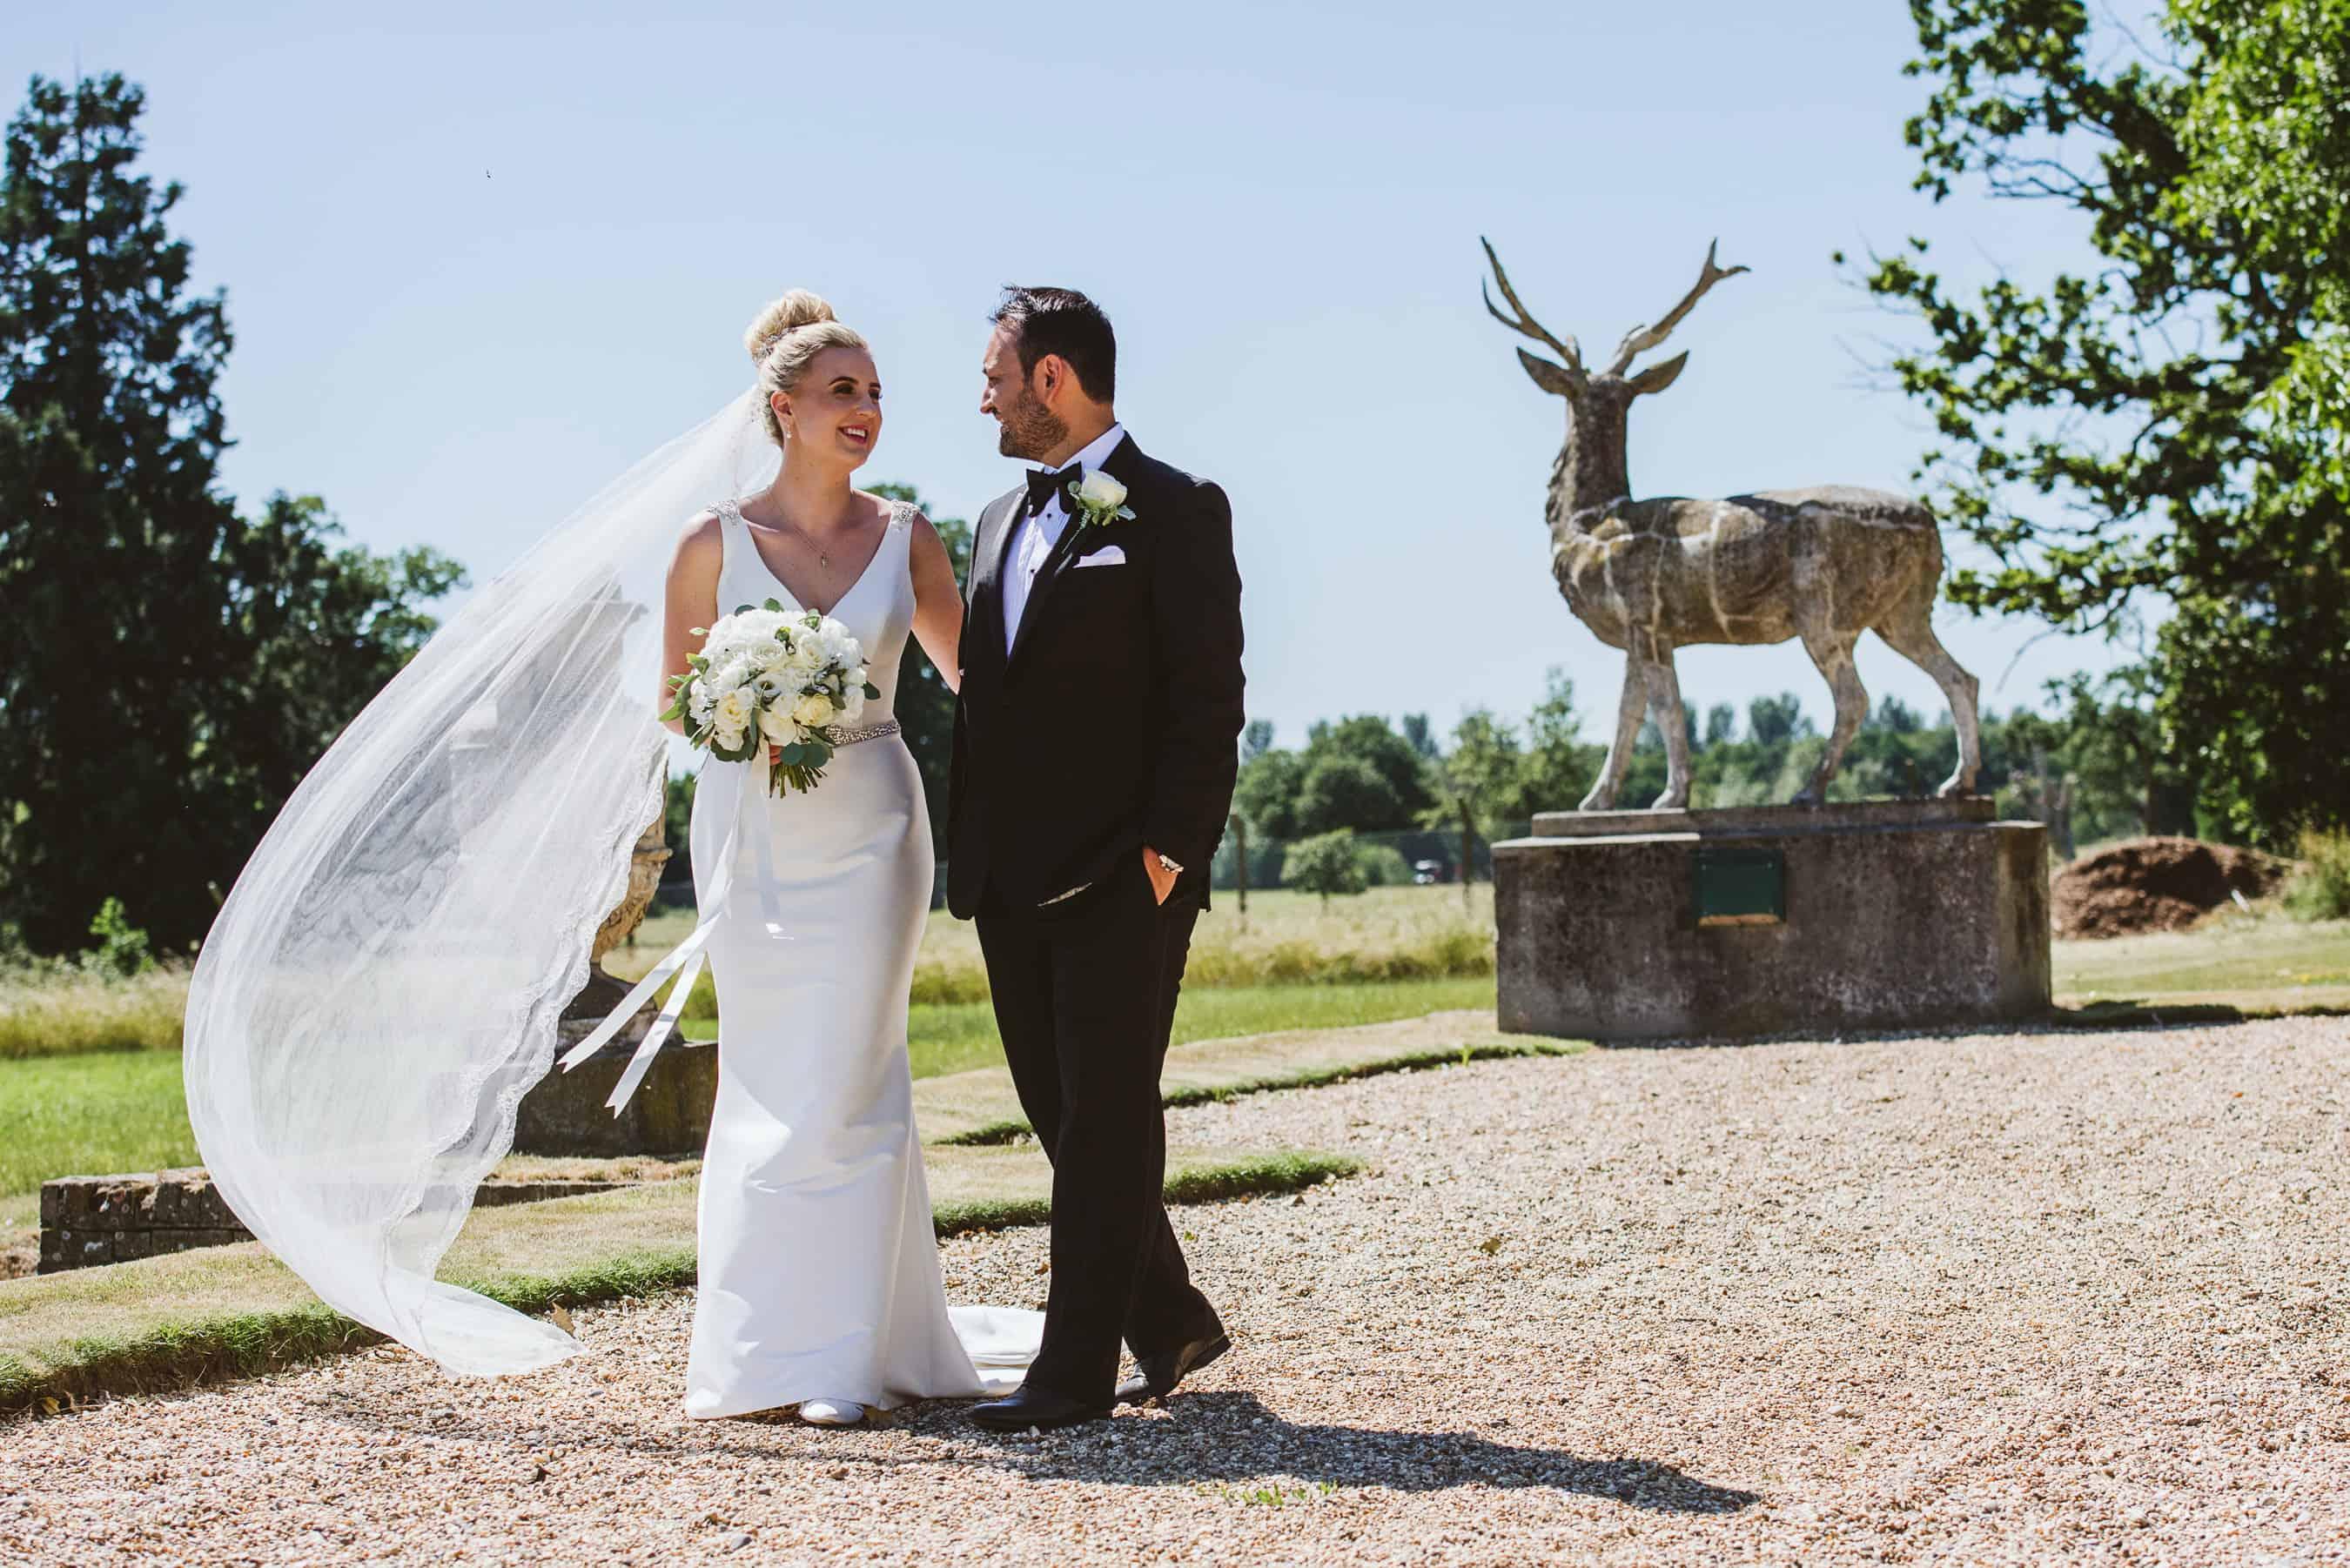 220618 Gosfield Hall Wedding Photography Lavenham Photographic 0132